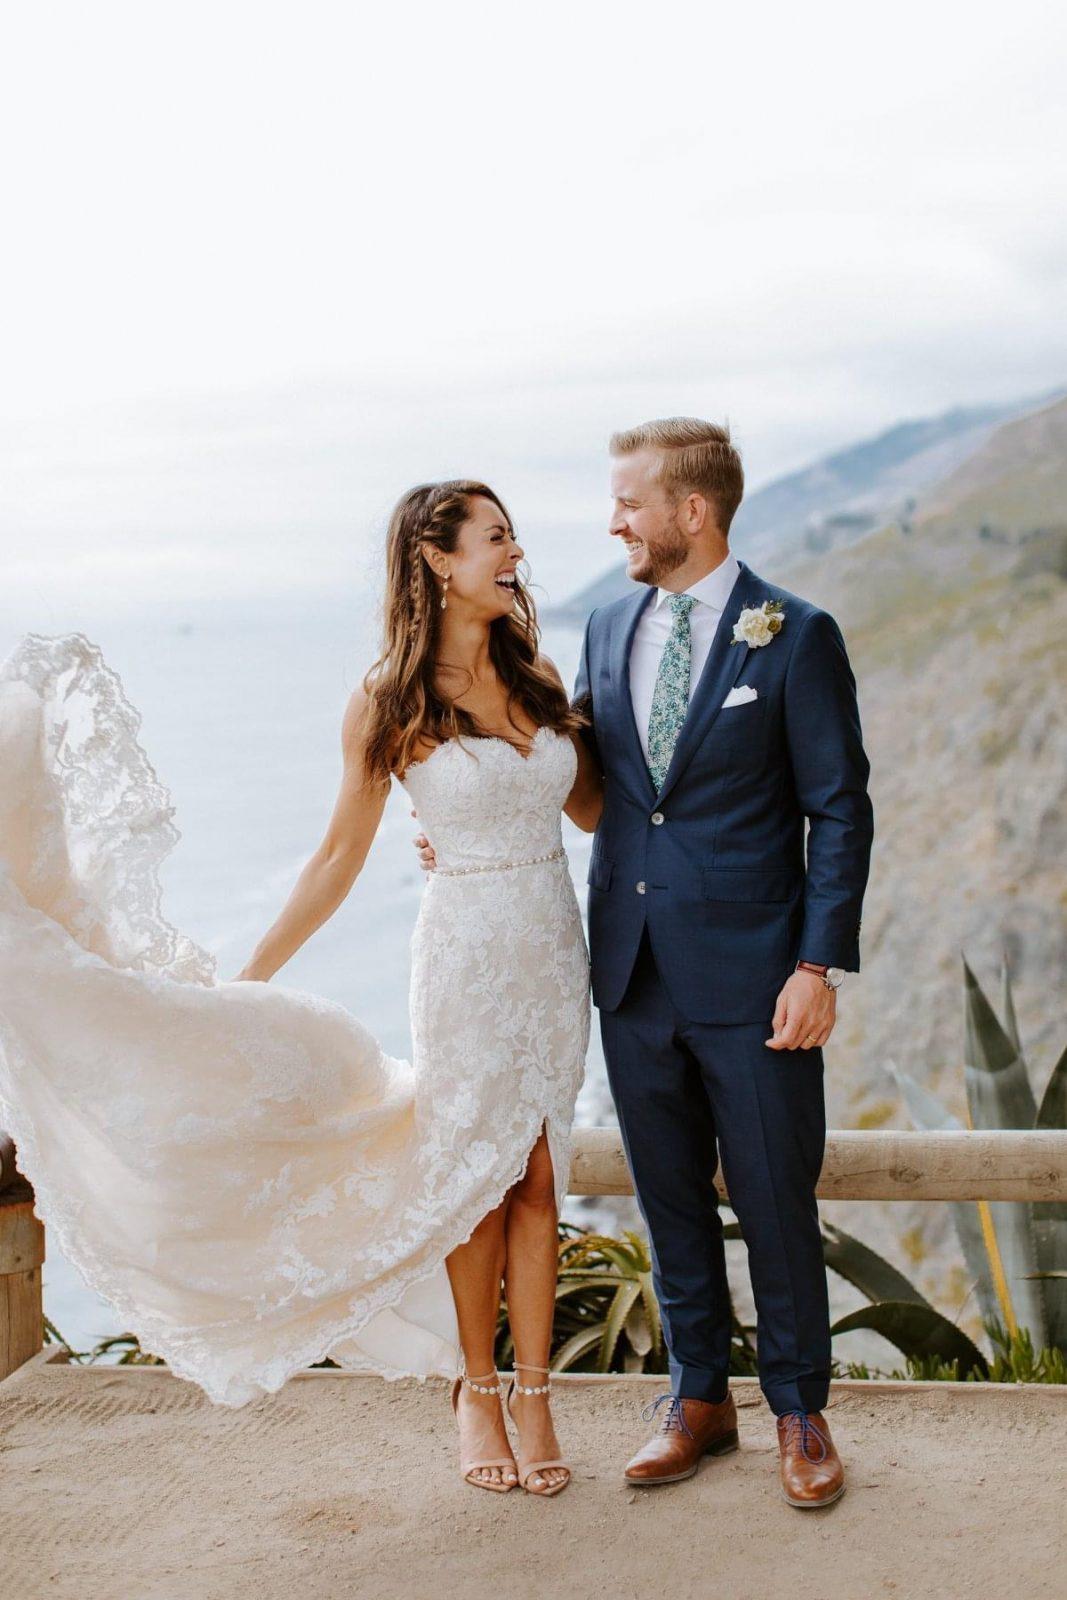 traje de novio azul marino corbata flores zapatos casual playa fistol pañuelo novia